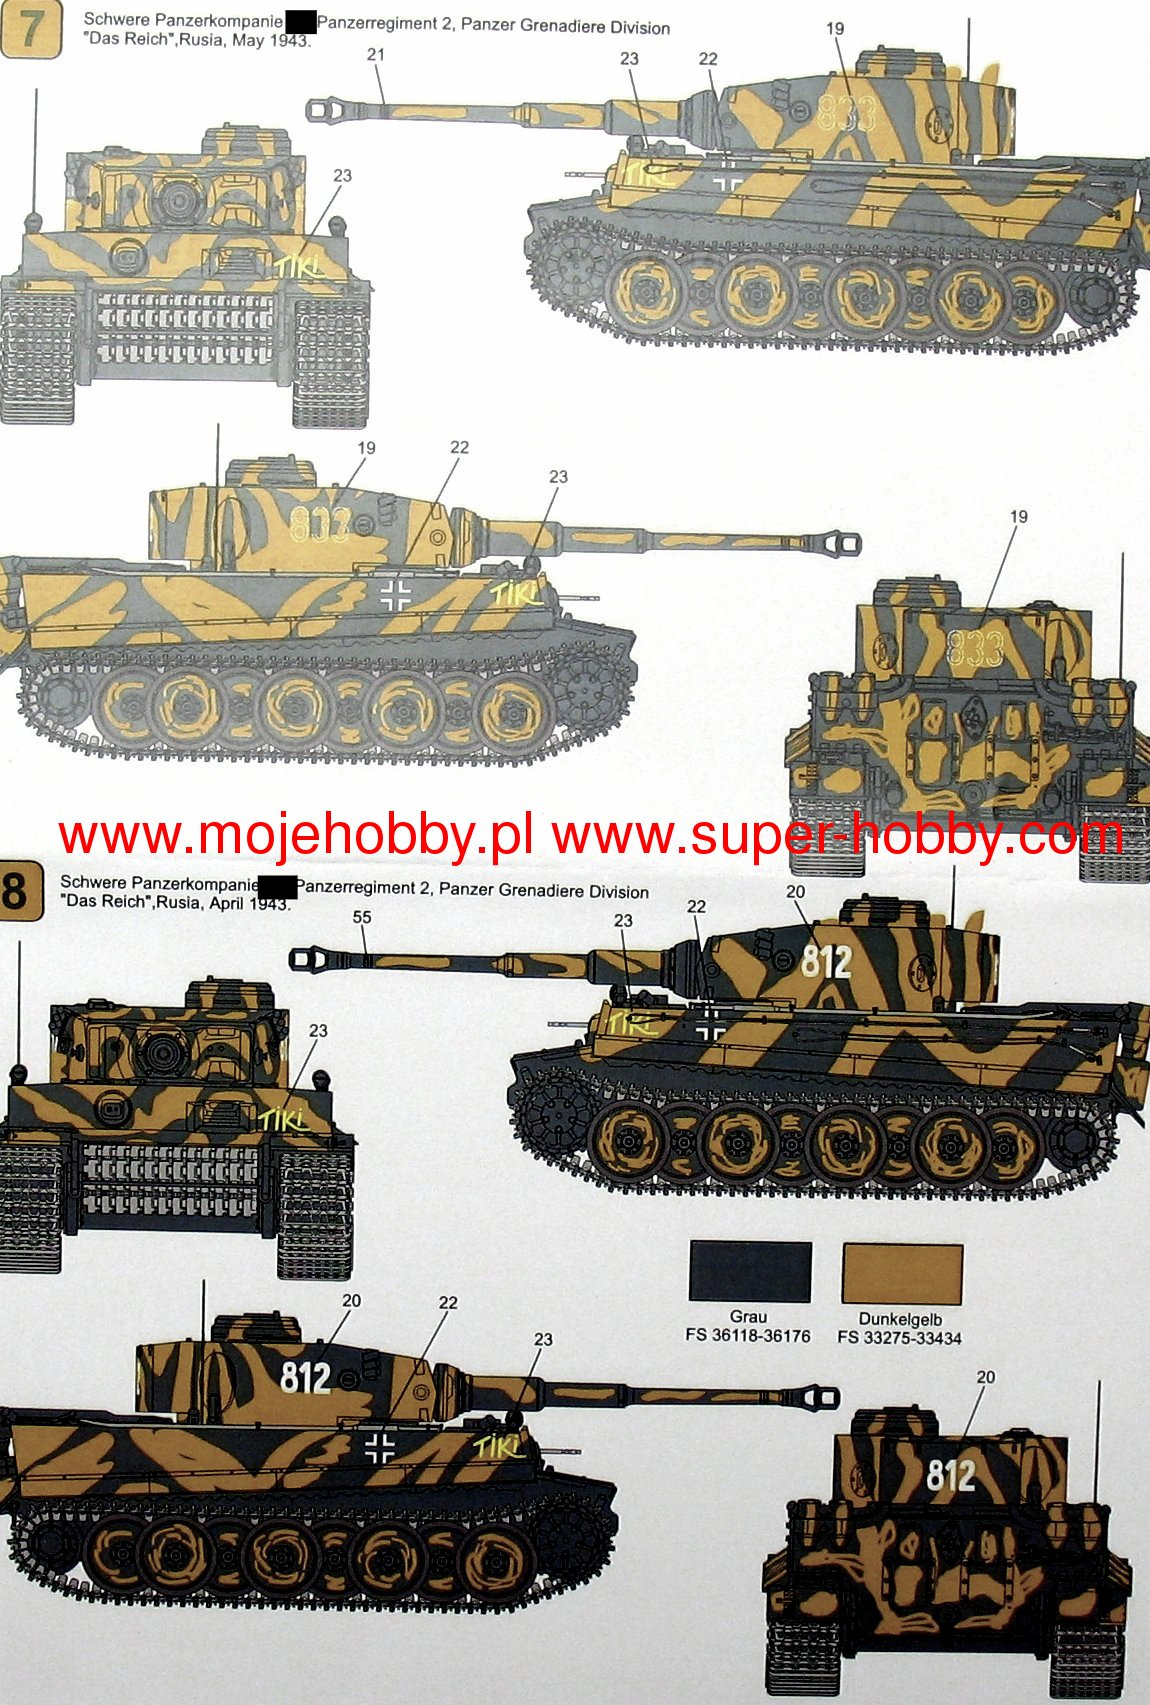 Techmod 1//35 Pz.Kpfw.VI Tiger Ausf.e Early Production # 35008